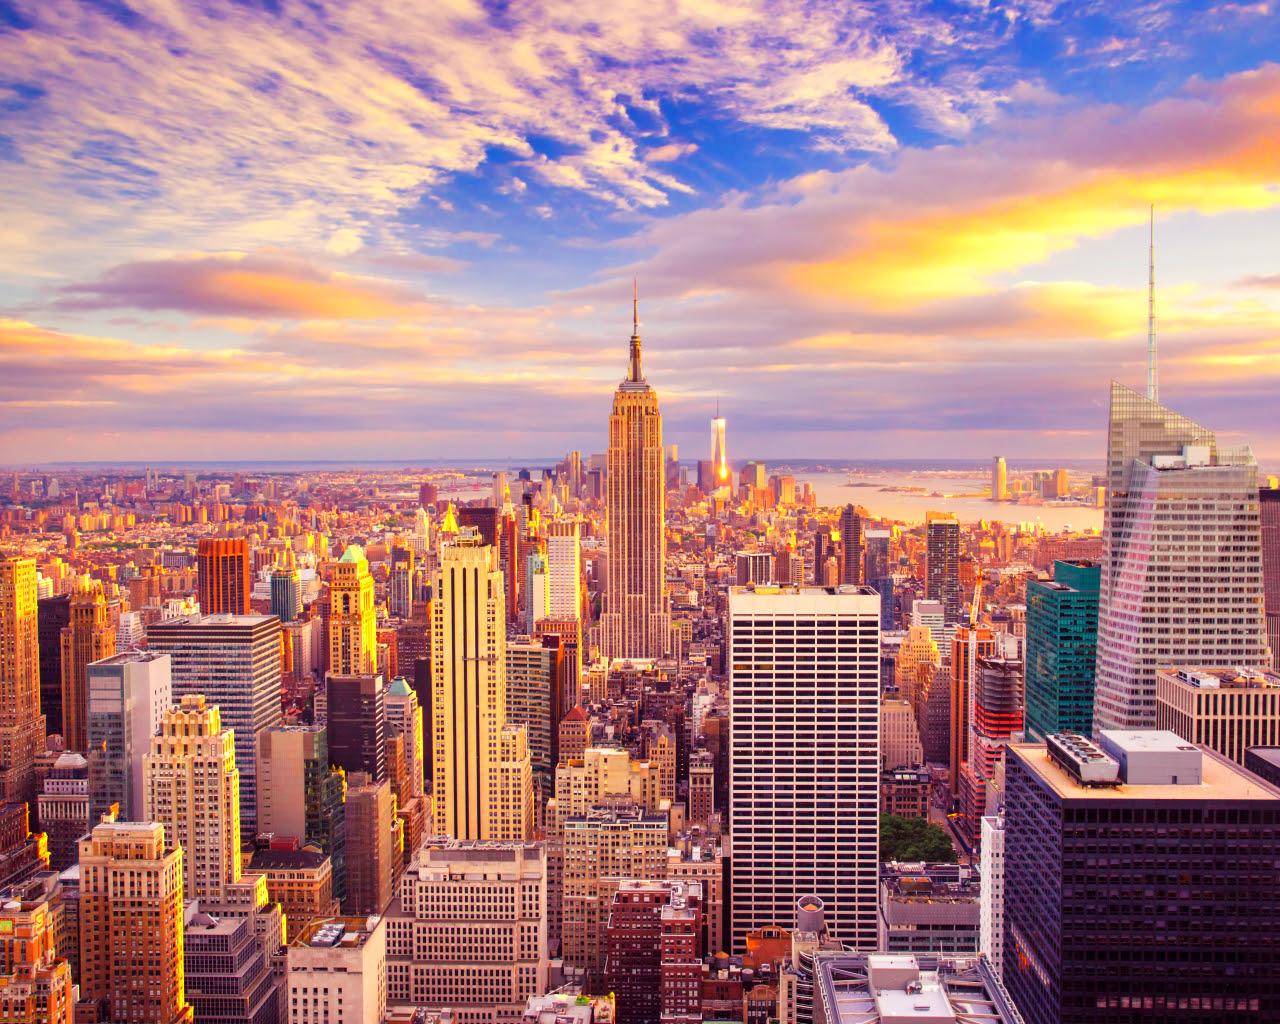 New York City United States Of America Wallpaper 40703286 Fanpop